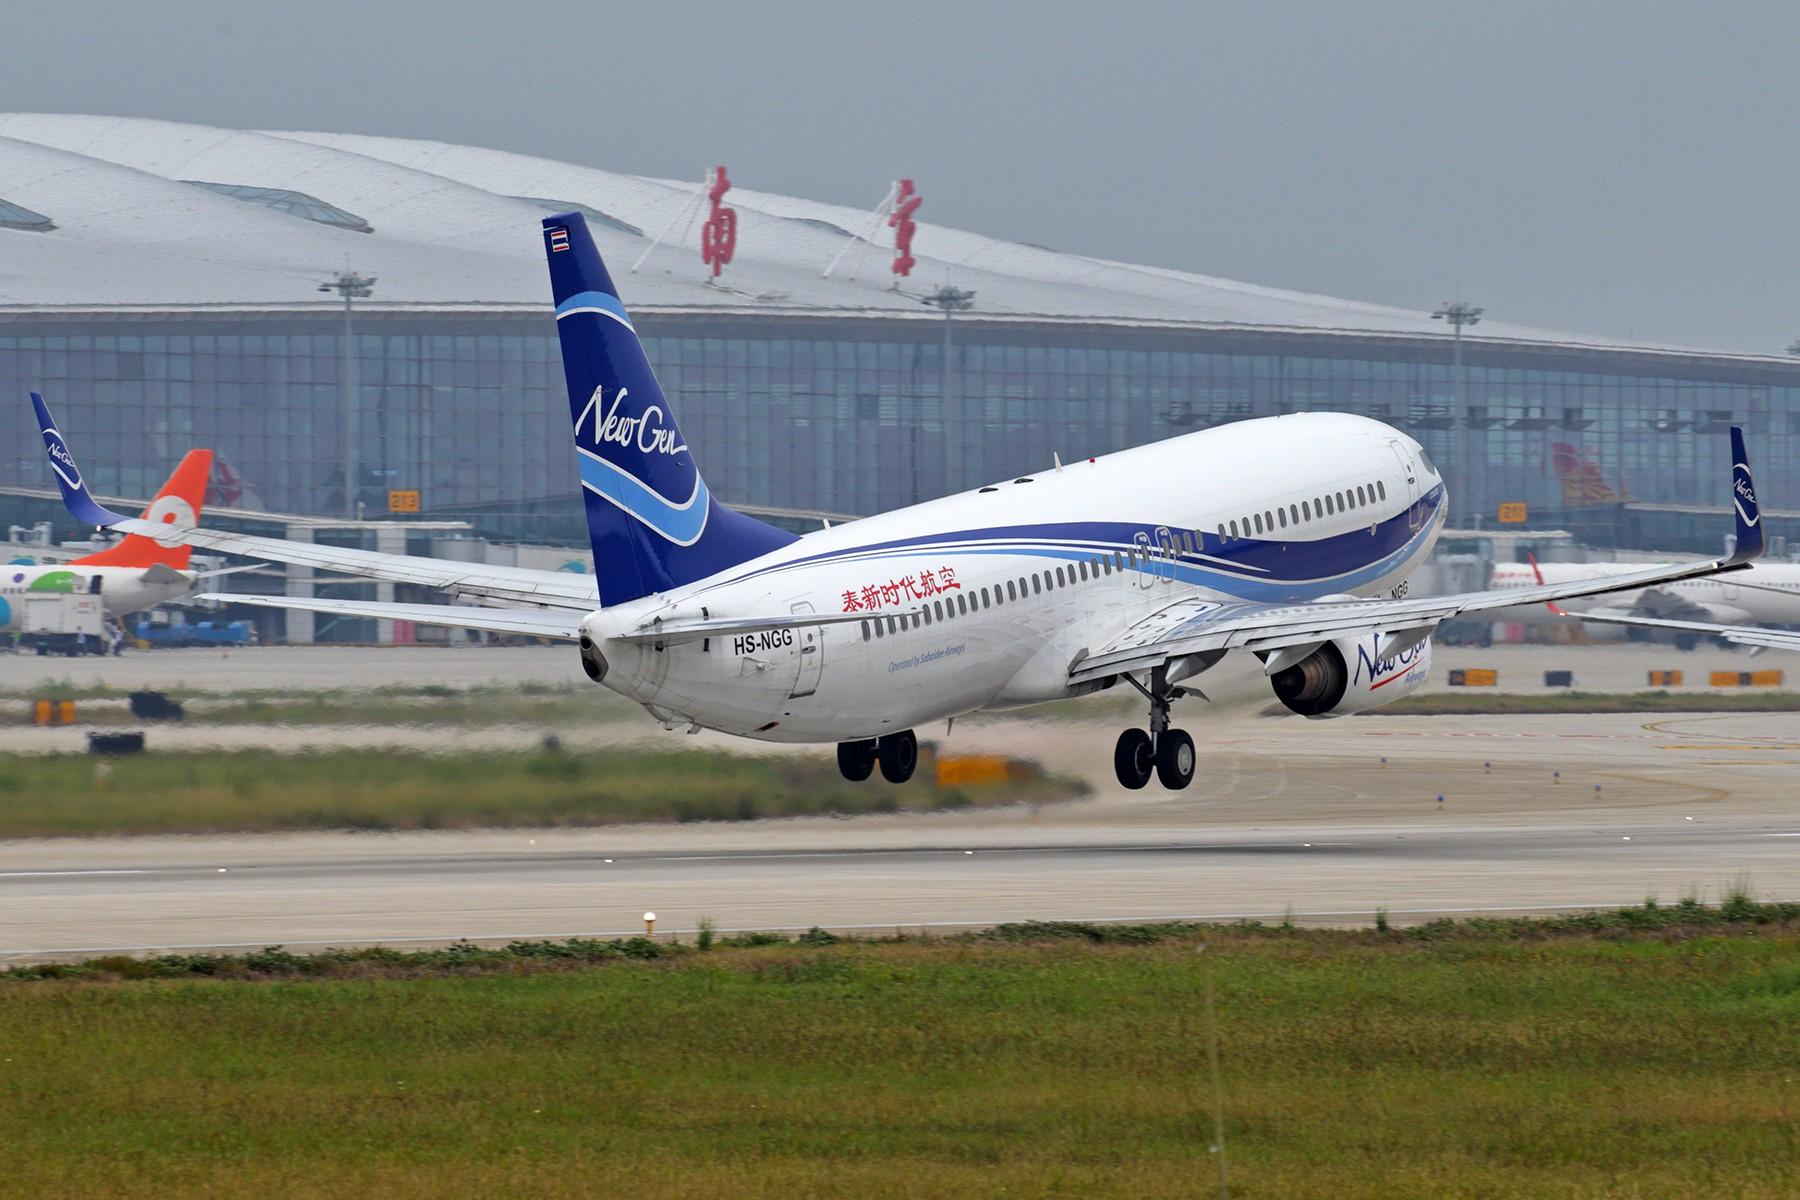 Re:[原创]【BLDDQ】******NKG07/25单跑道运行中****** BOEING 737-800 HS-NGG 中国南京禄口国际机场